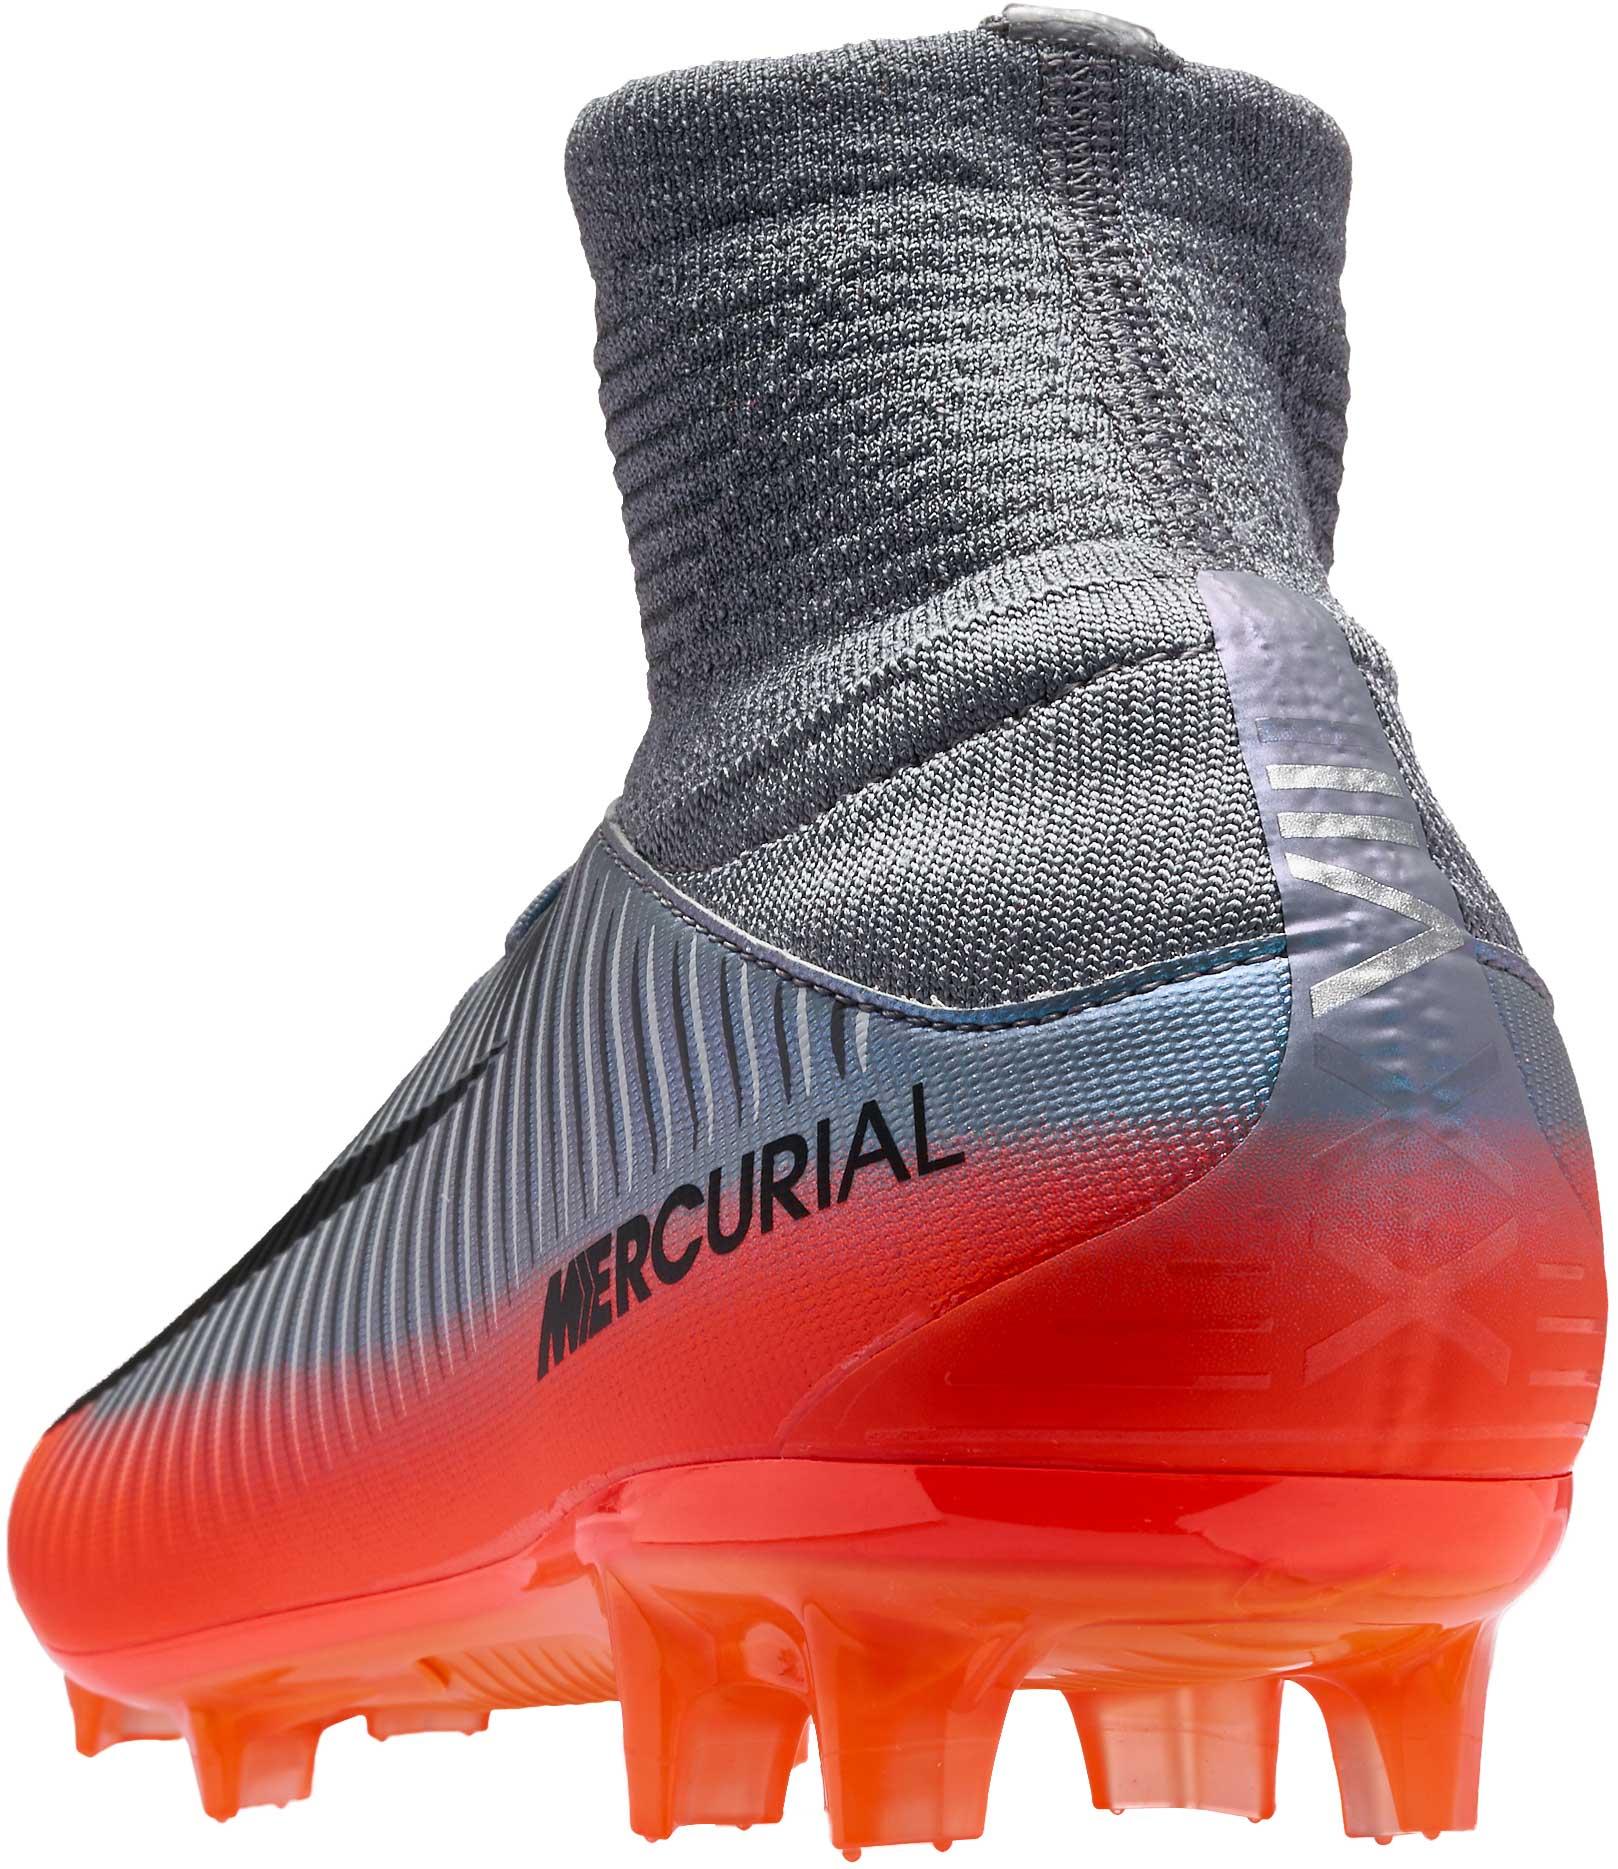 finest selection 97e11 b1cc0 Nike Mercurial Veloce III DF FG – CR7 – Cool Grey Metallic Hematite